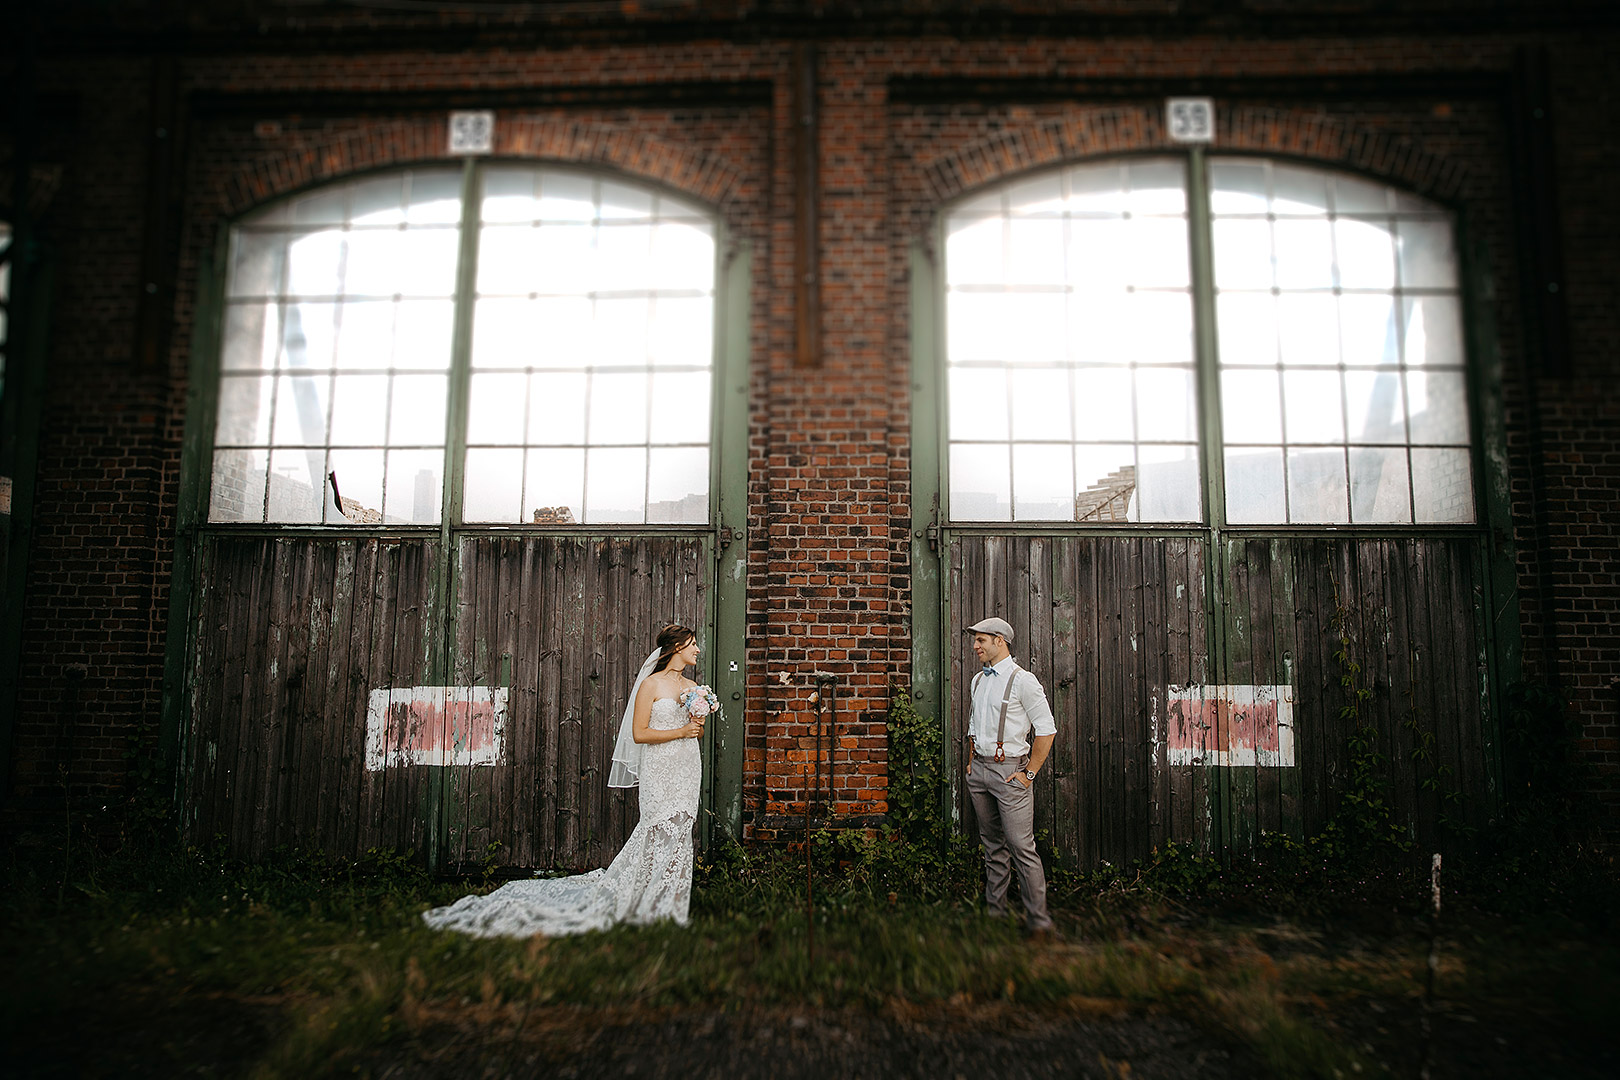 portrait_wedding_annkathrinundandreas_58